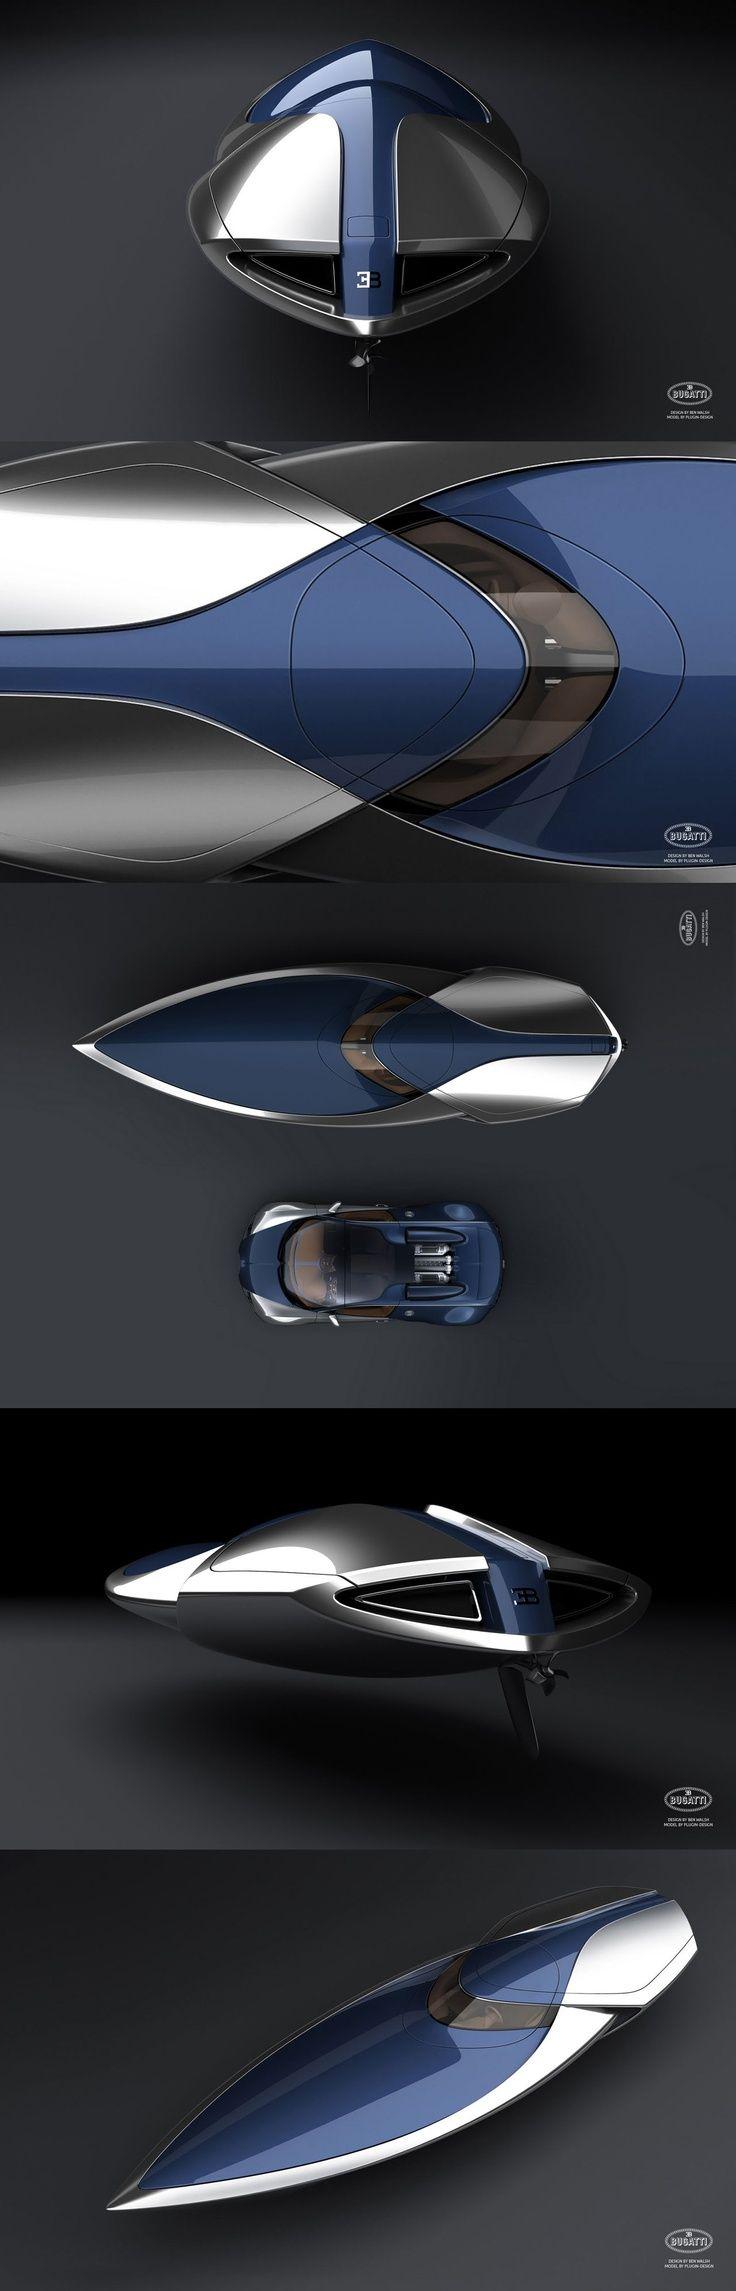 Bugatti W16 Engine Diagram Engine Information